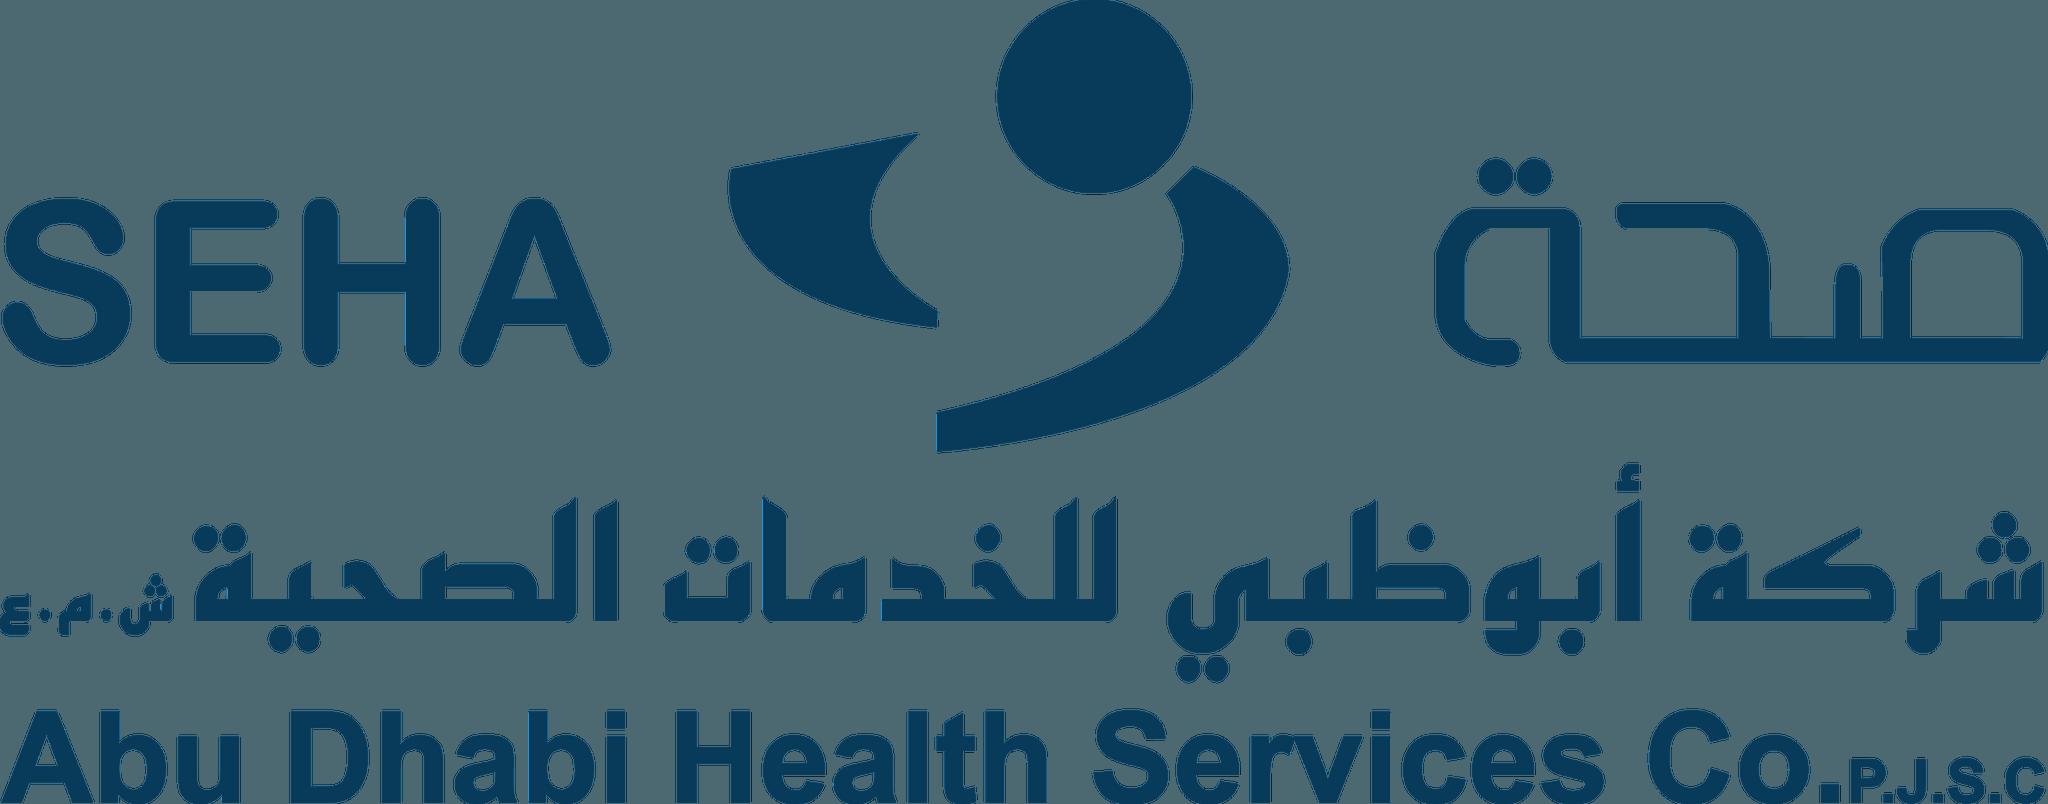 Abu Dhabi Health Services Company - Seha